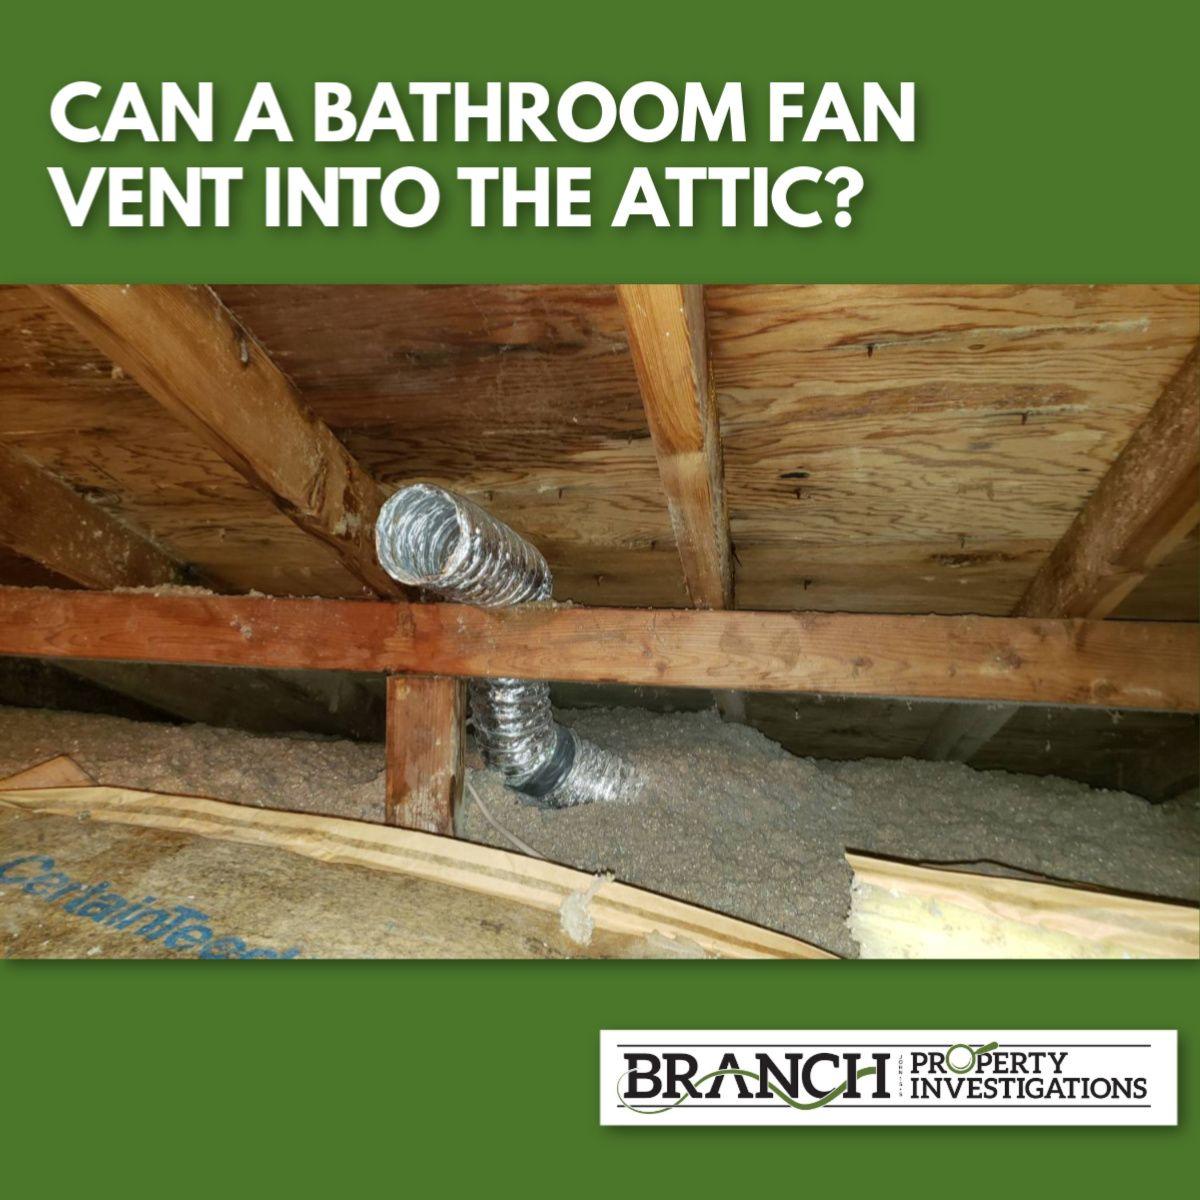 Can A Bathroom Fan Vent Into The Attic In 2020 Home Inspection Bathroom Vent Fan House Fan